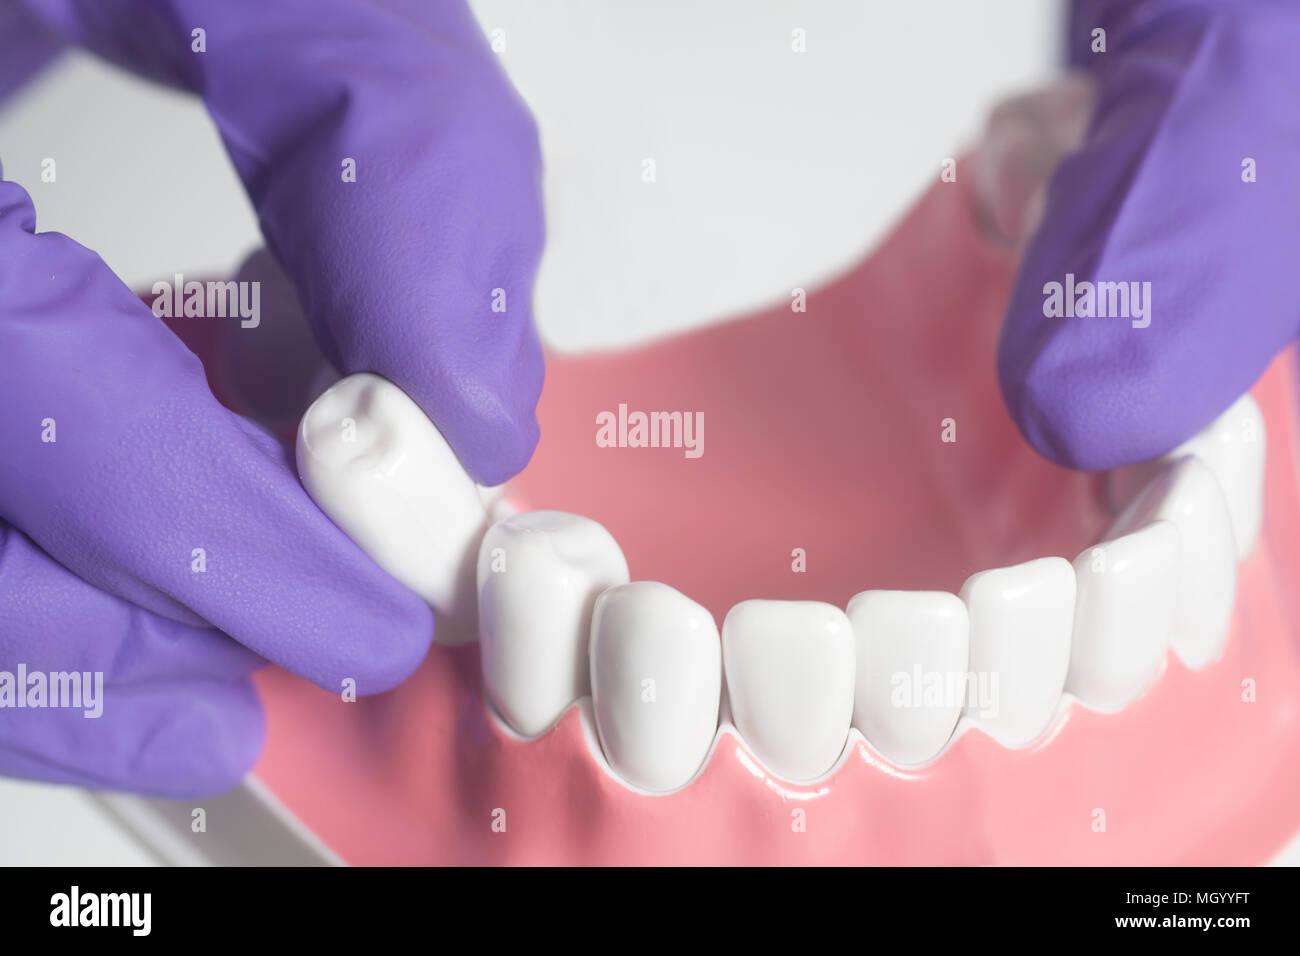 Dental model teeth is used to demonstration of tooth